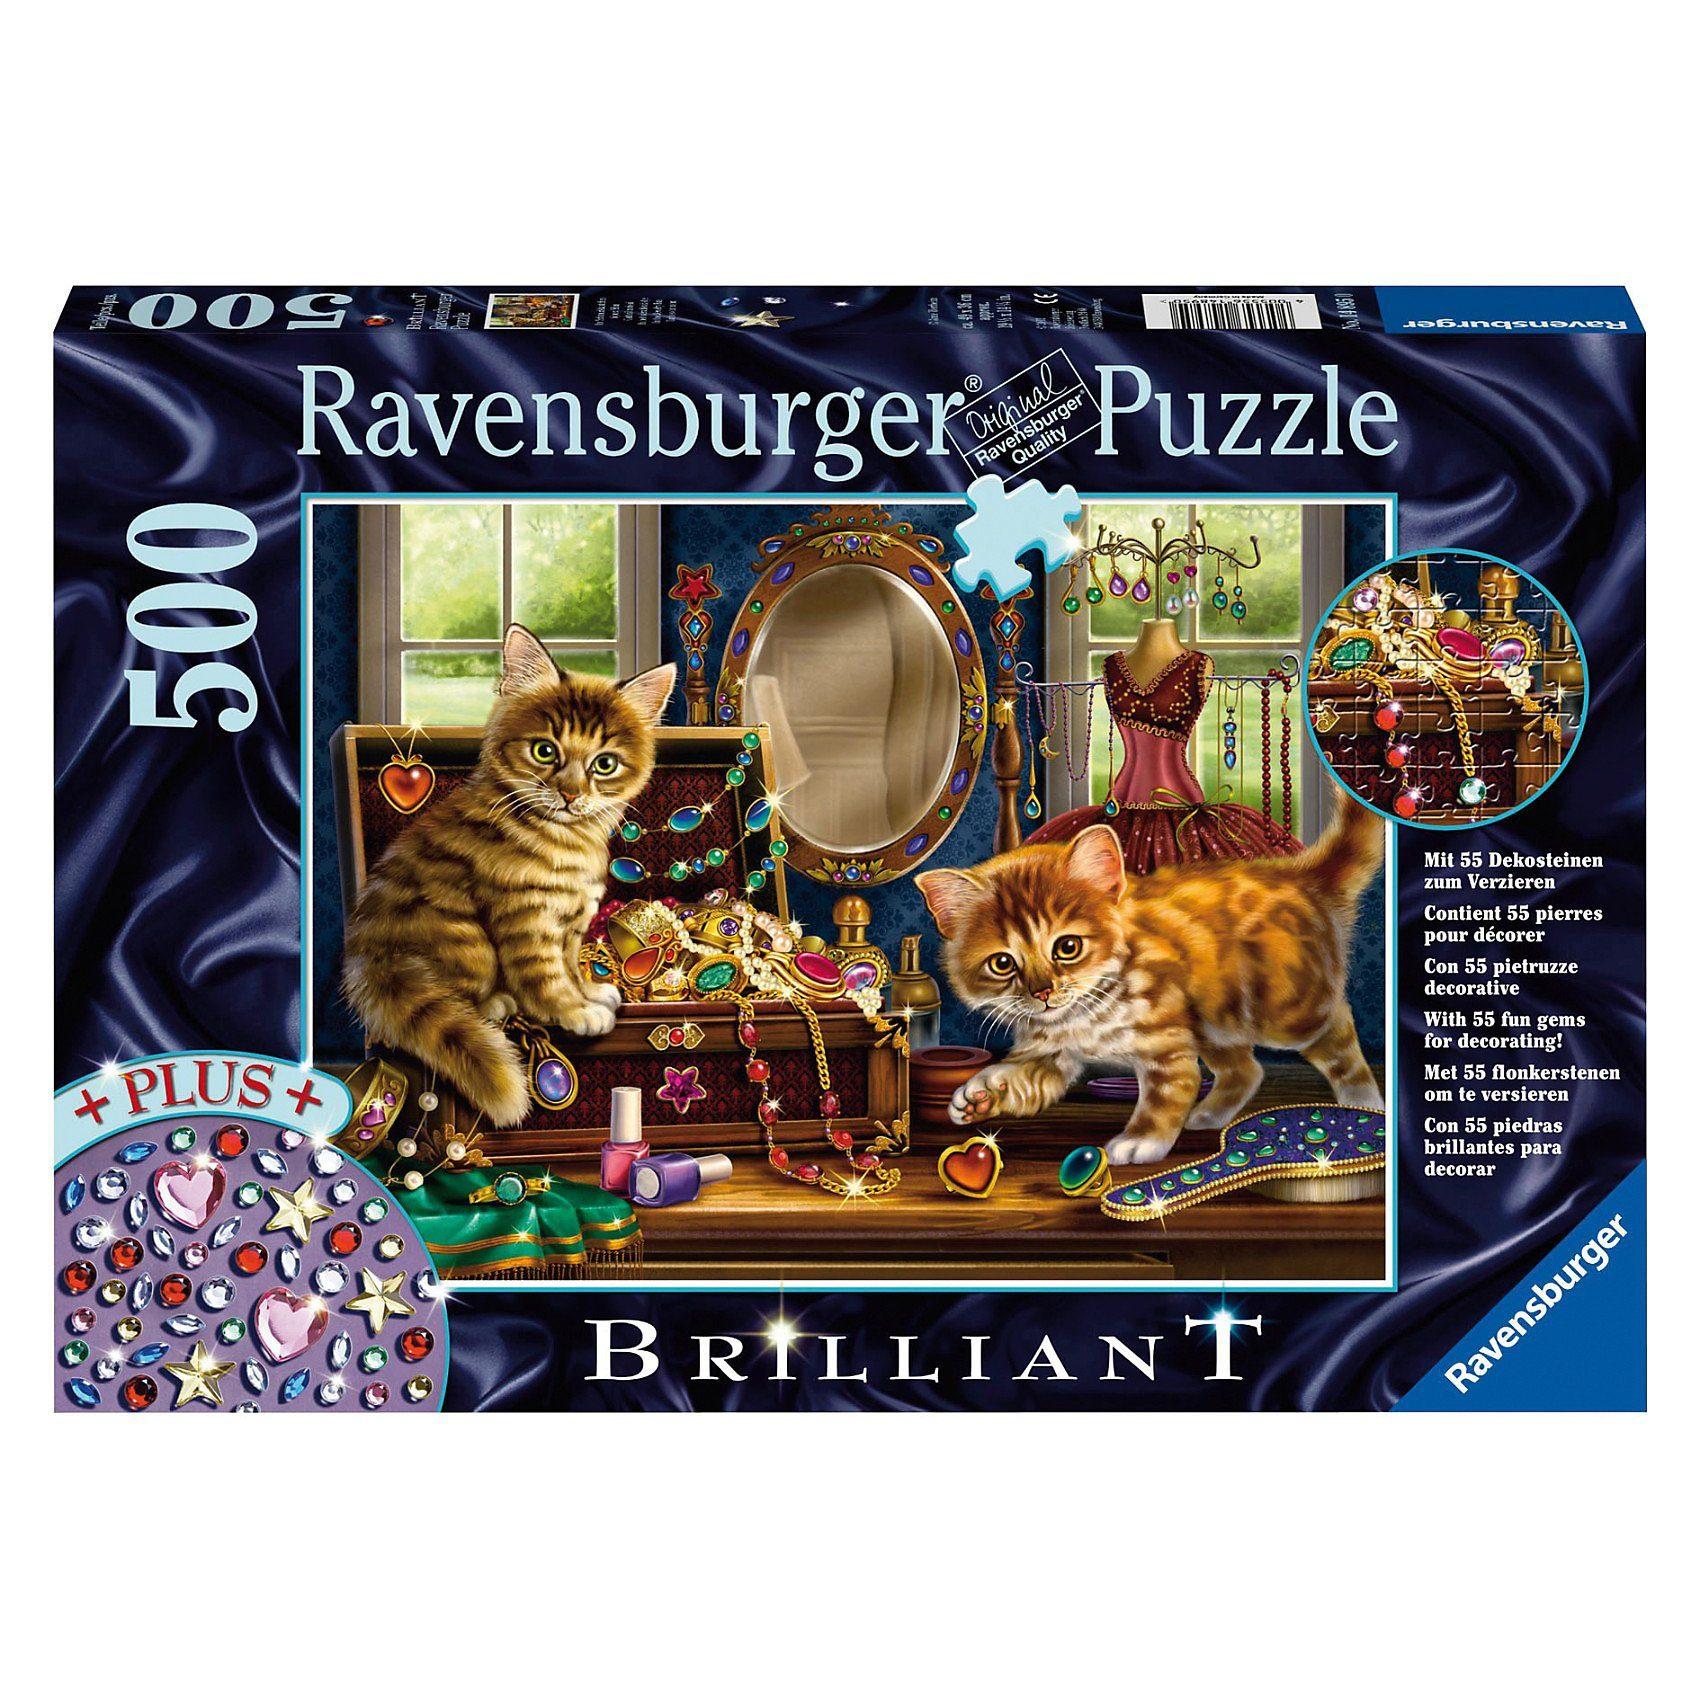 Ravensburger Brilliant Puzzle Im Schmuckkästchen 500 Teile